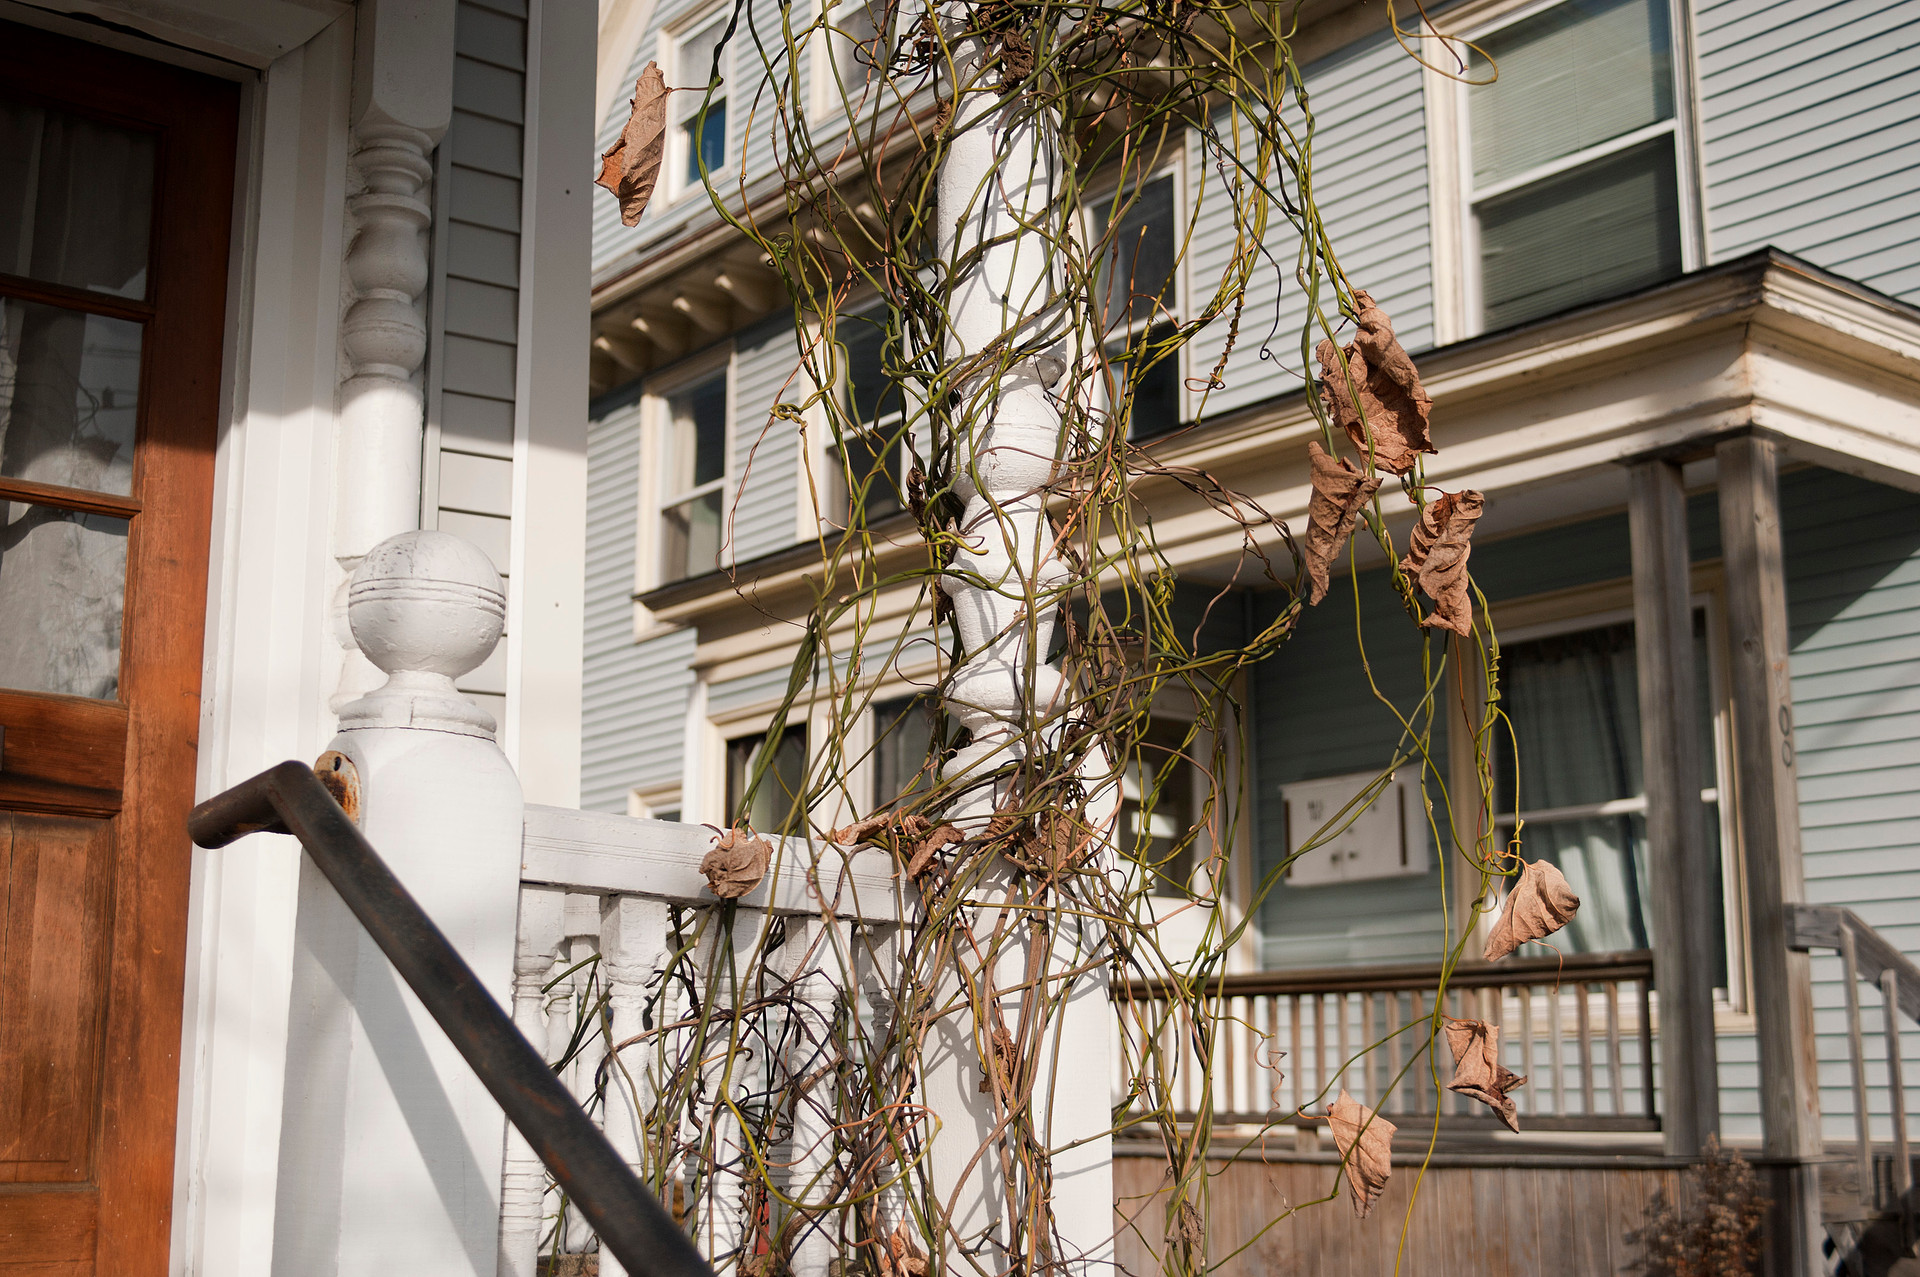 Neighbors and Vine